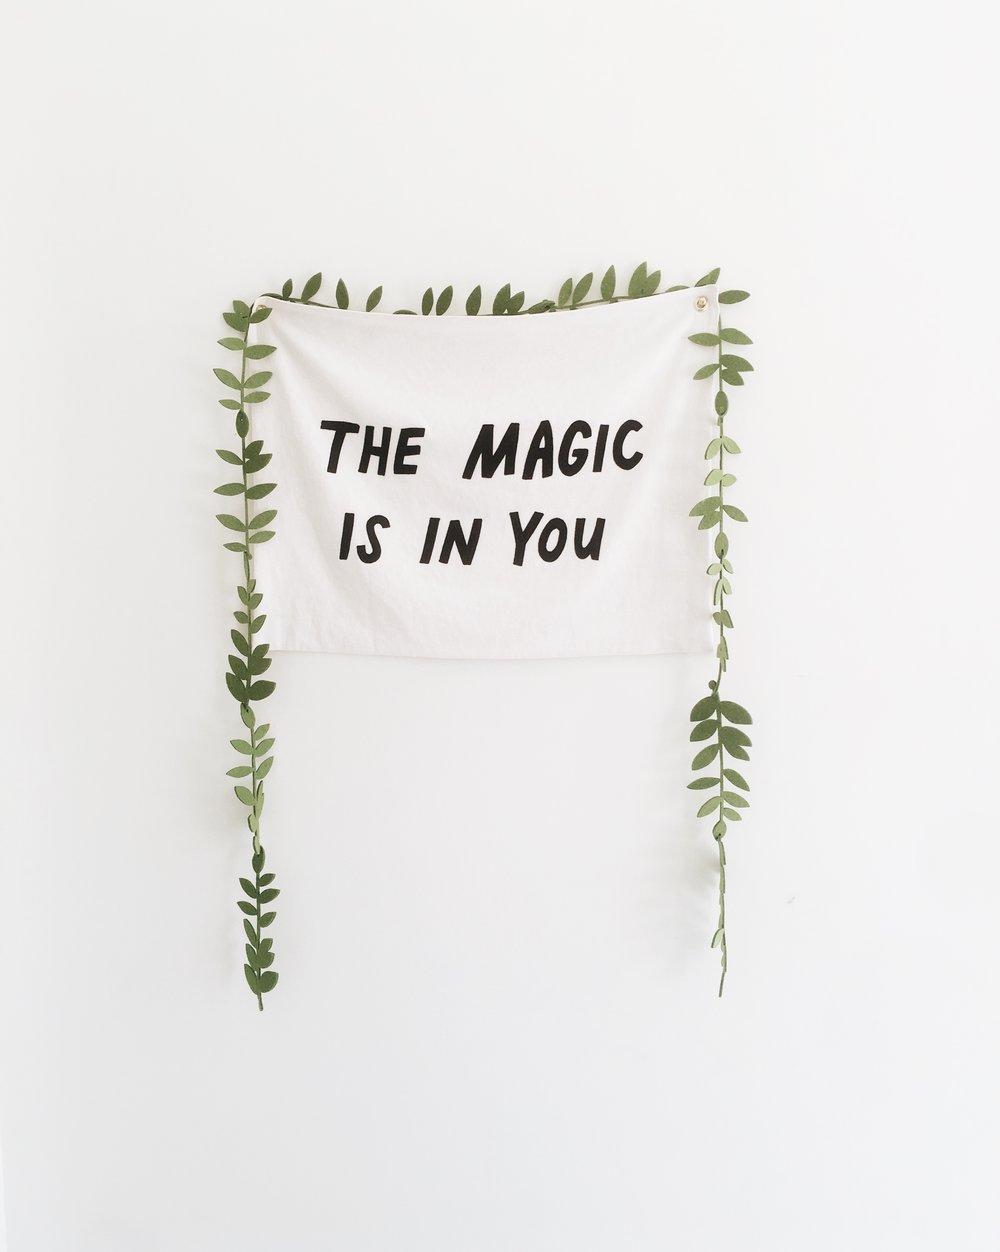 Magic in You anna-sullivan-575433-unsplash.jpg